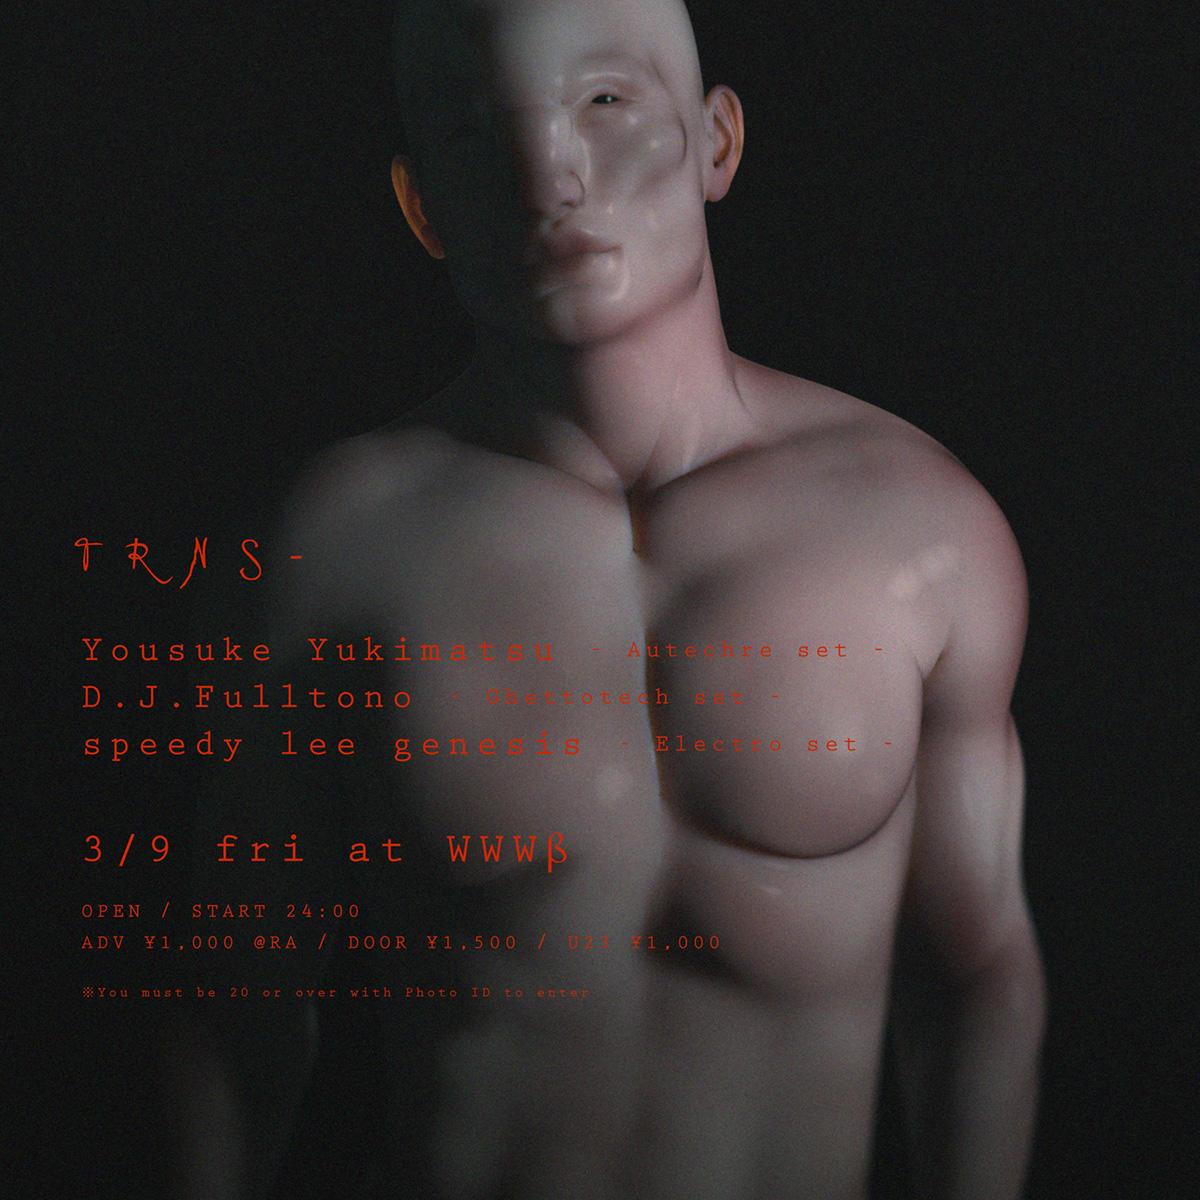 Yousuke Yukimatsu / D.J.Fulltono / speedy lee genesis